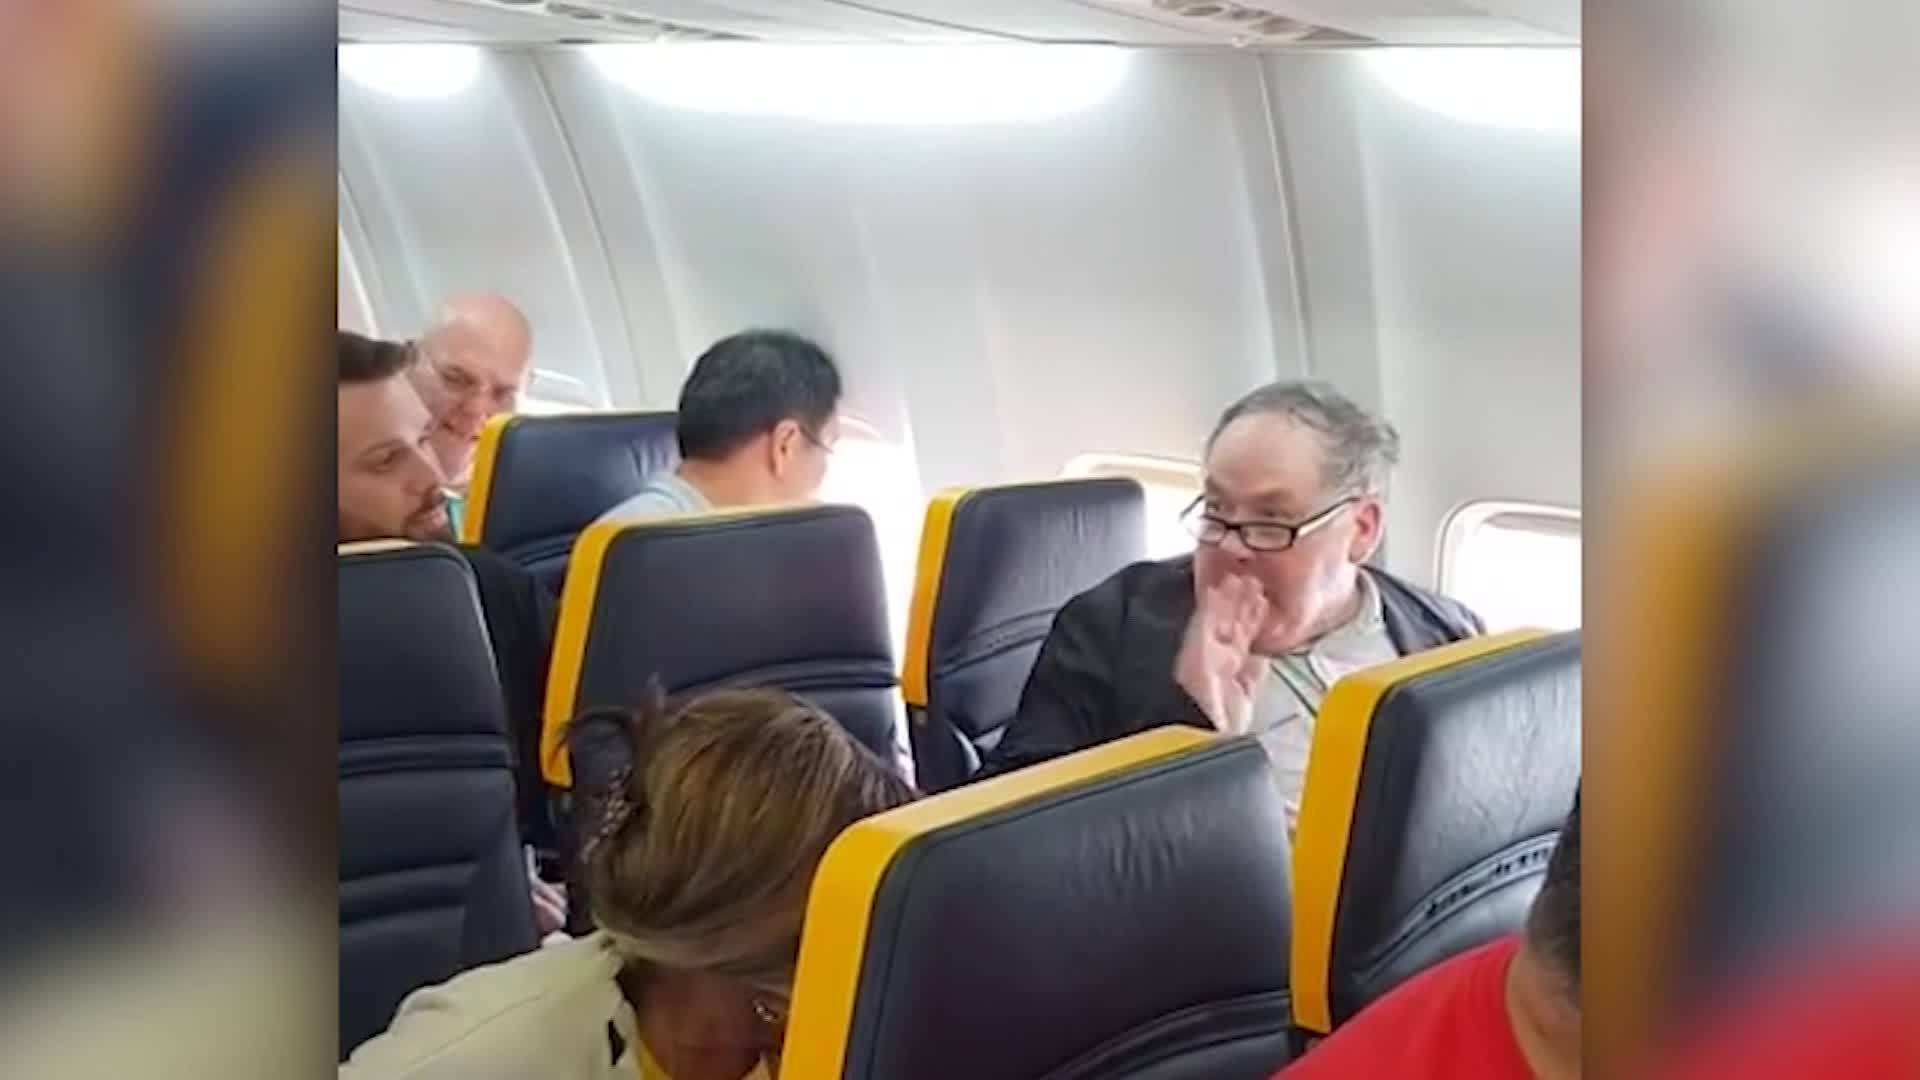 Man_goes_on_racist_rant_on_Ryanair_fligh_0_20181022152534-846653543